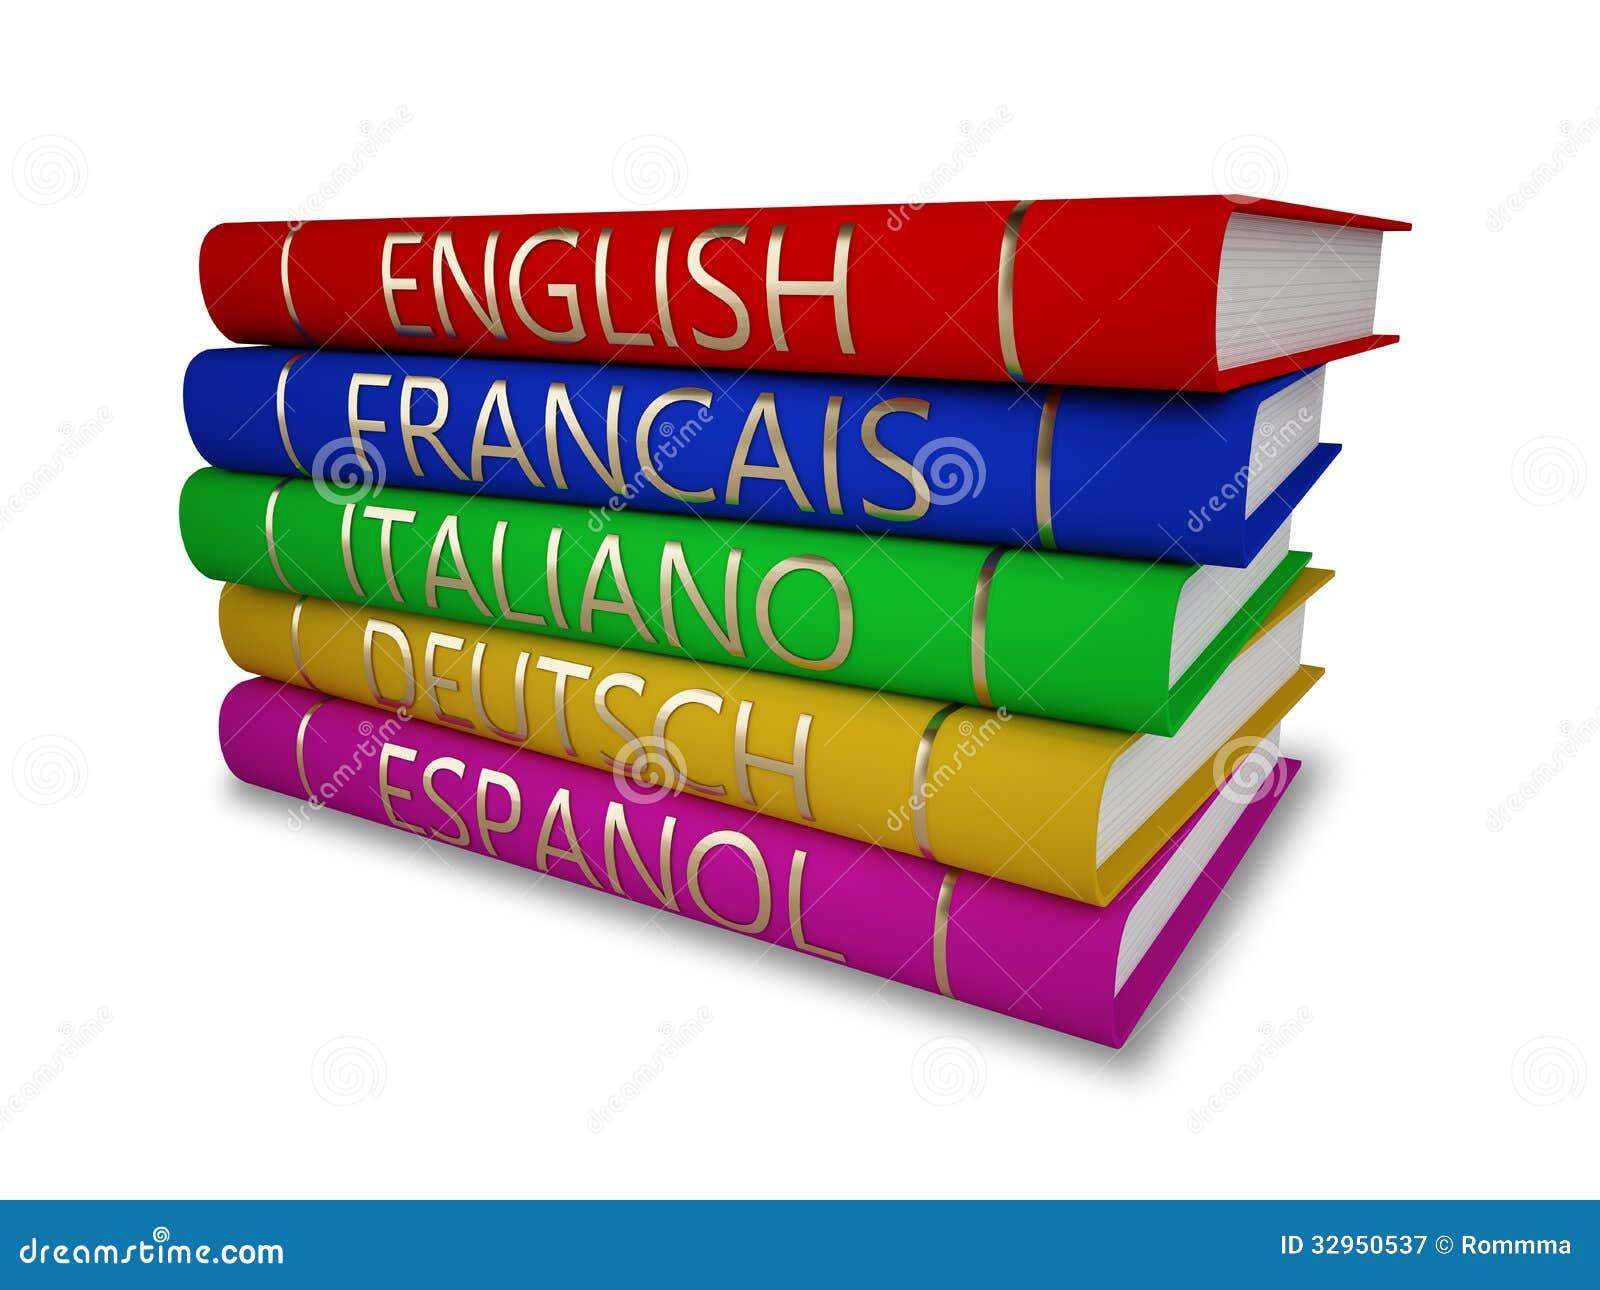 Romanian Language/Grammar